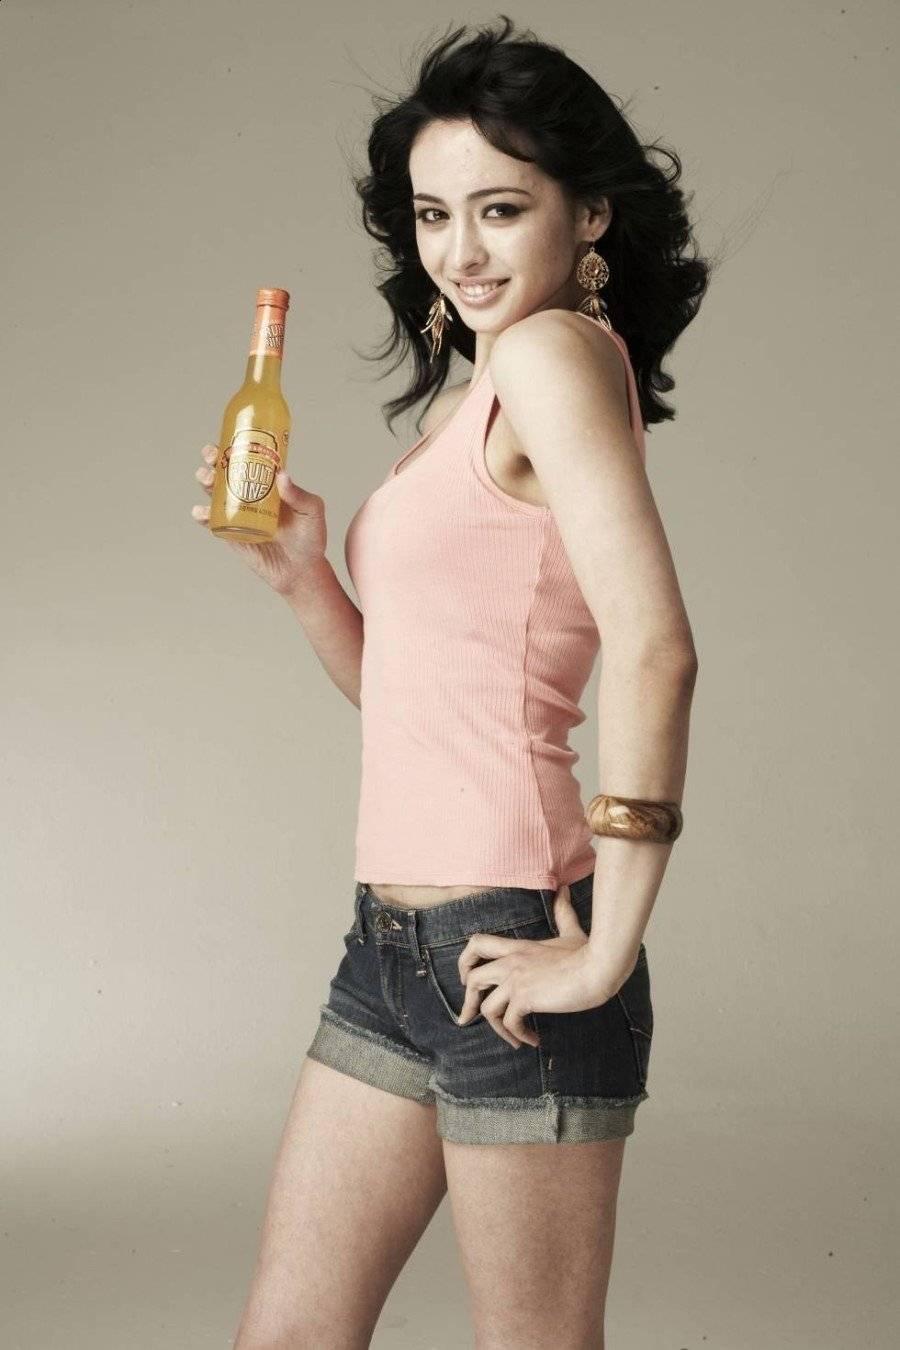 Guzal Tursunova (uad6cuc798 ud22cub974uc218ub178ubc14, Uzbek actress, tv personality ...